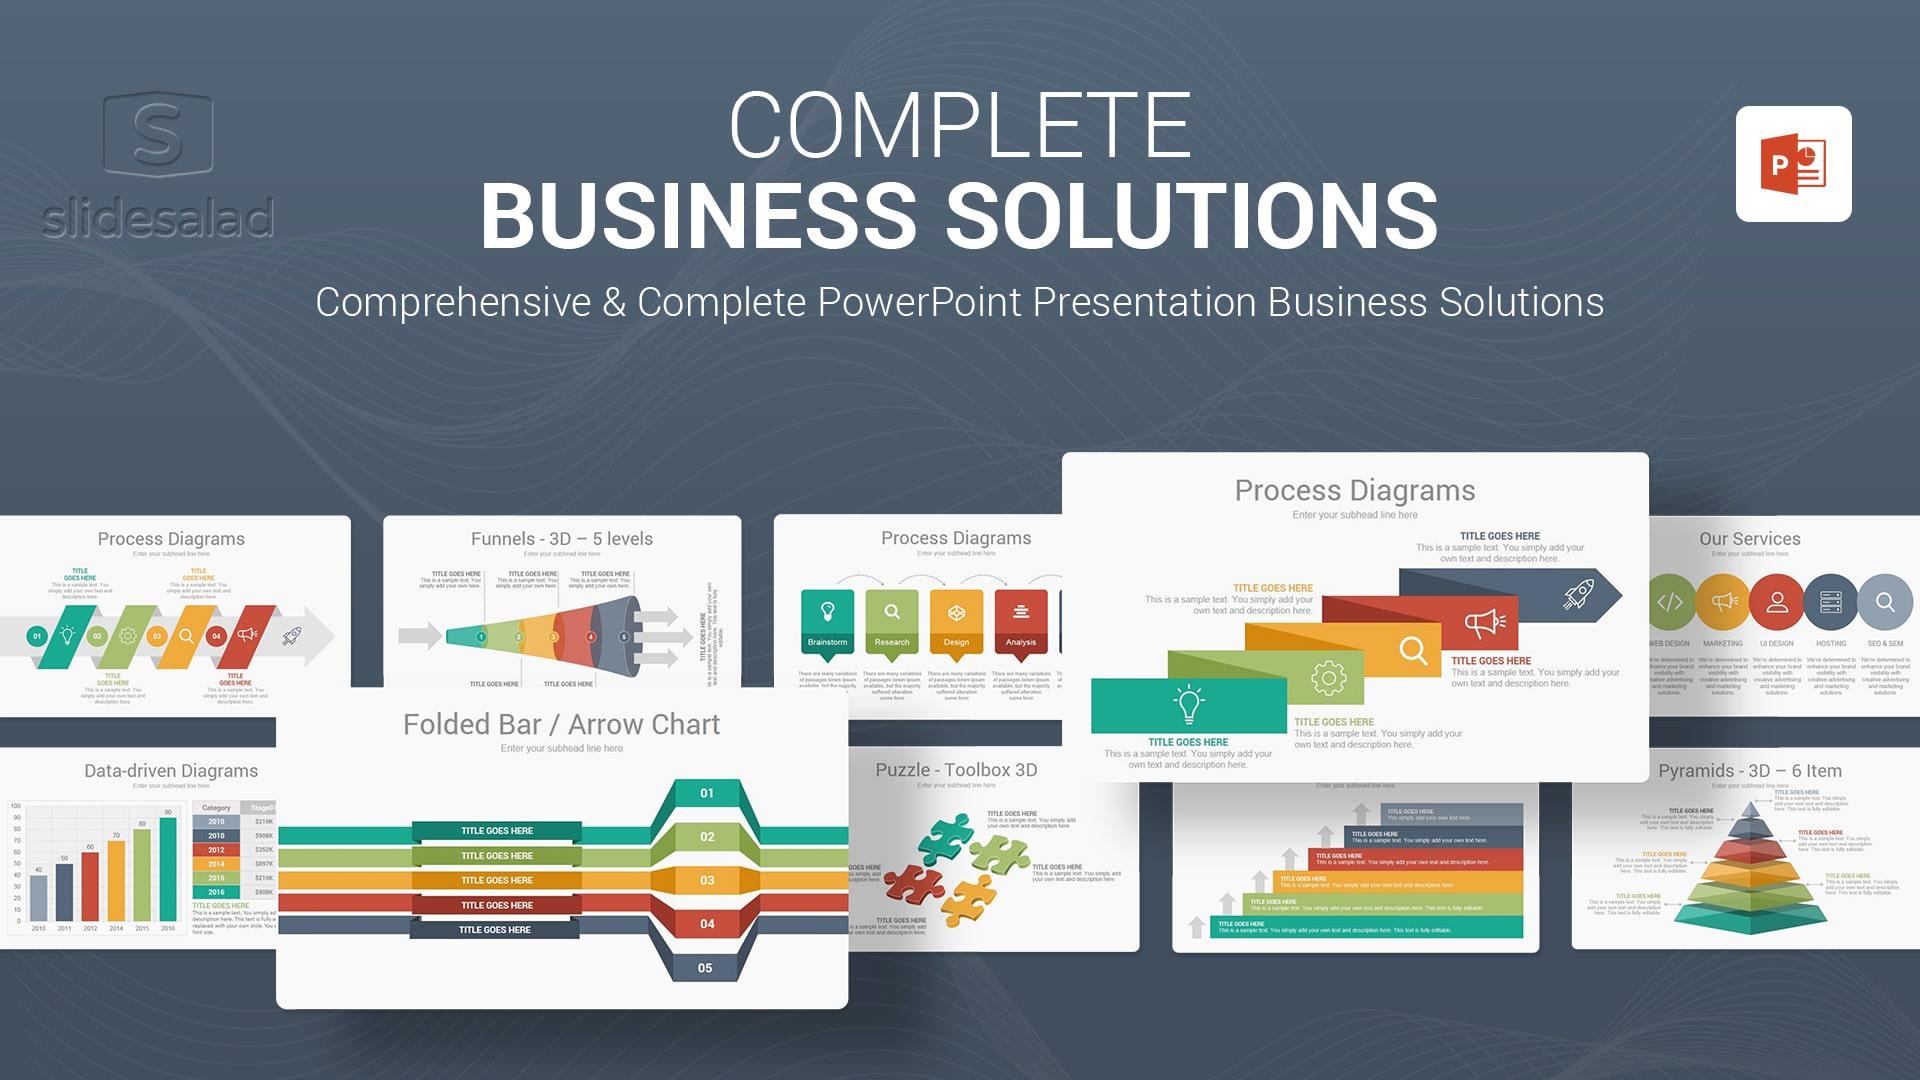 Complete Business Solutions Multipurpose PowerPoint Presentation Template - Multipurpose Custom PowerPoint Template